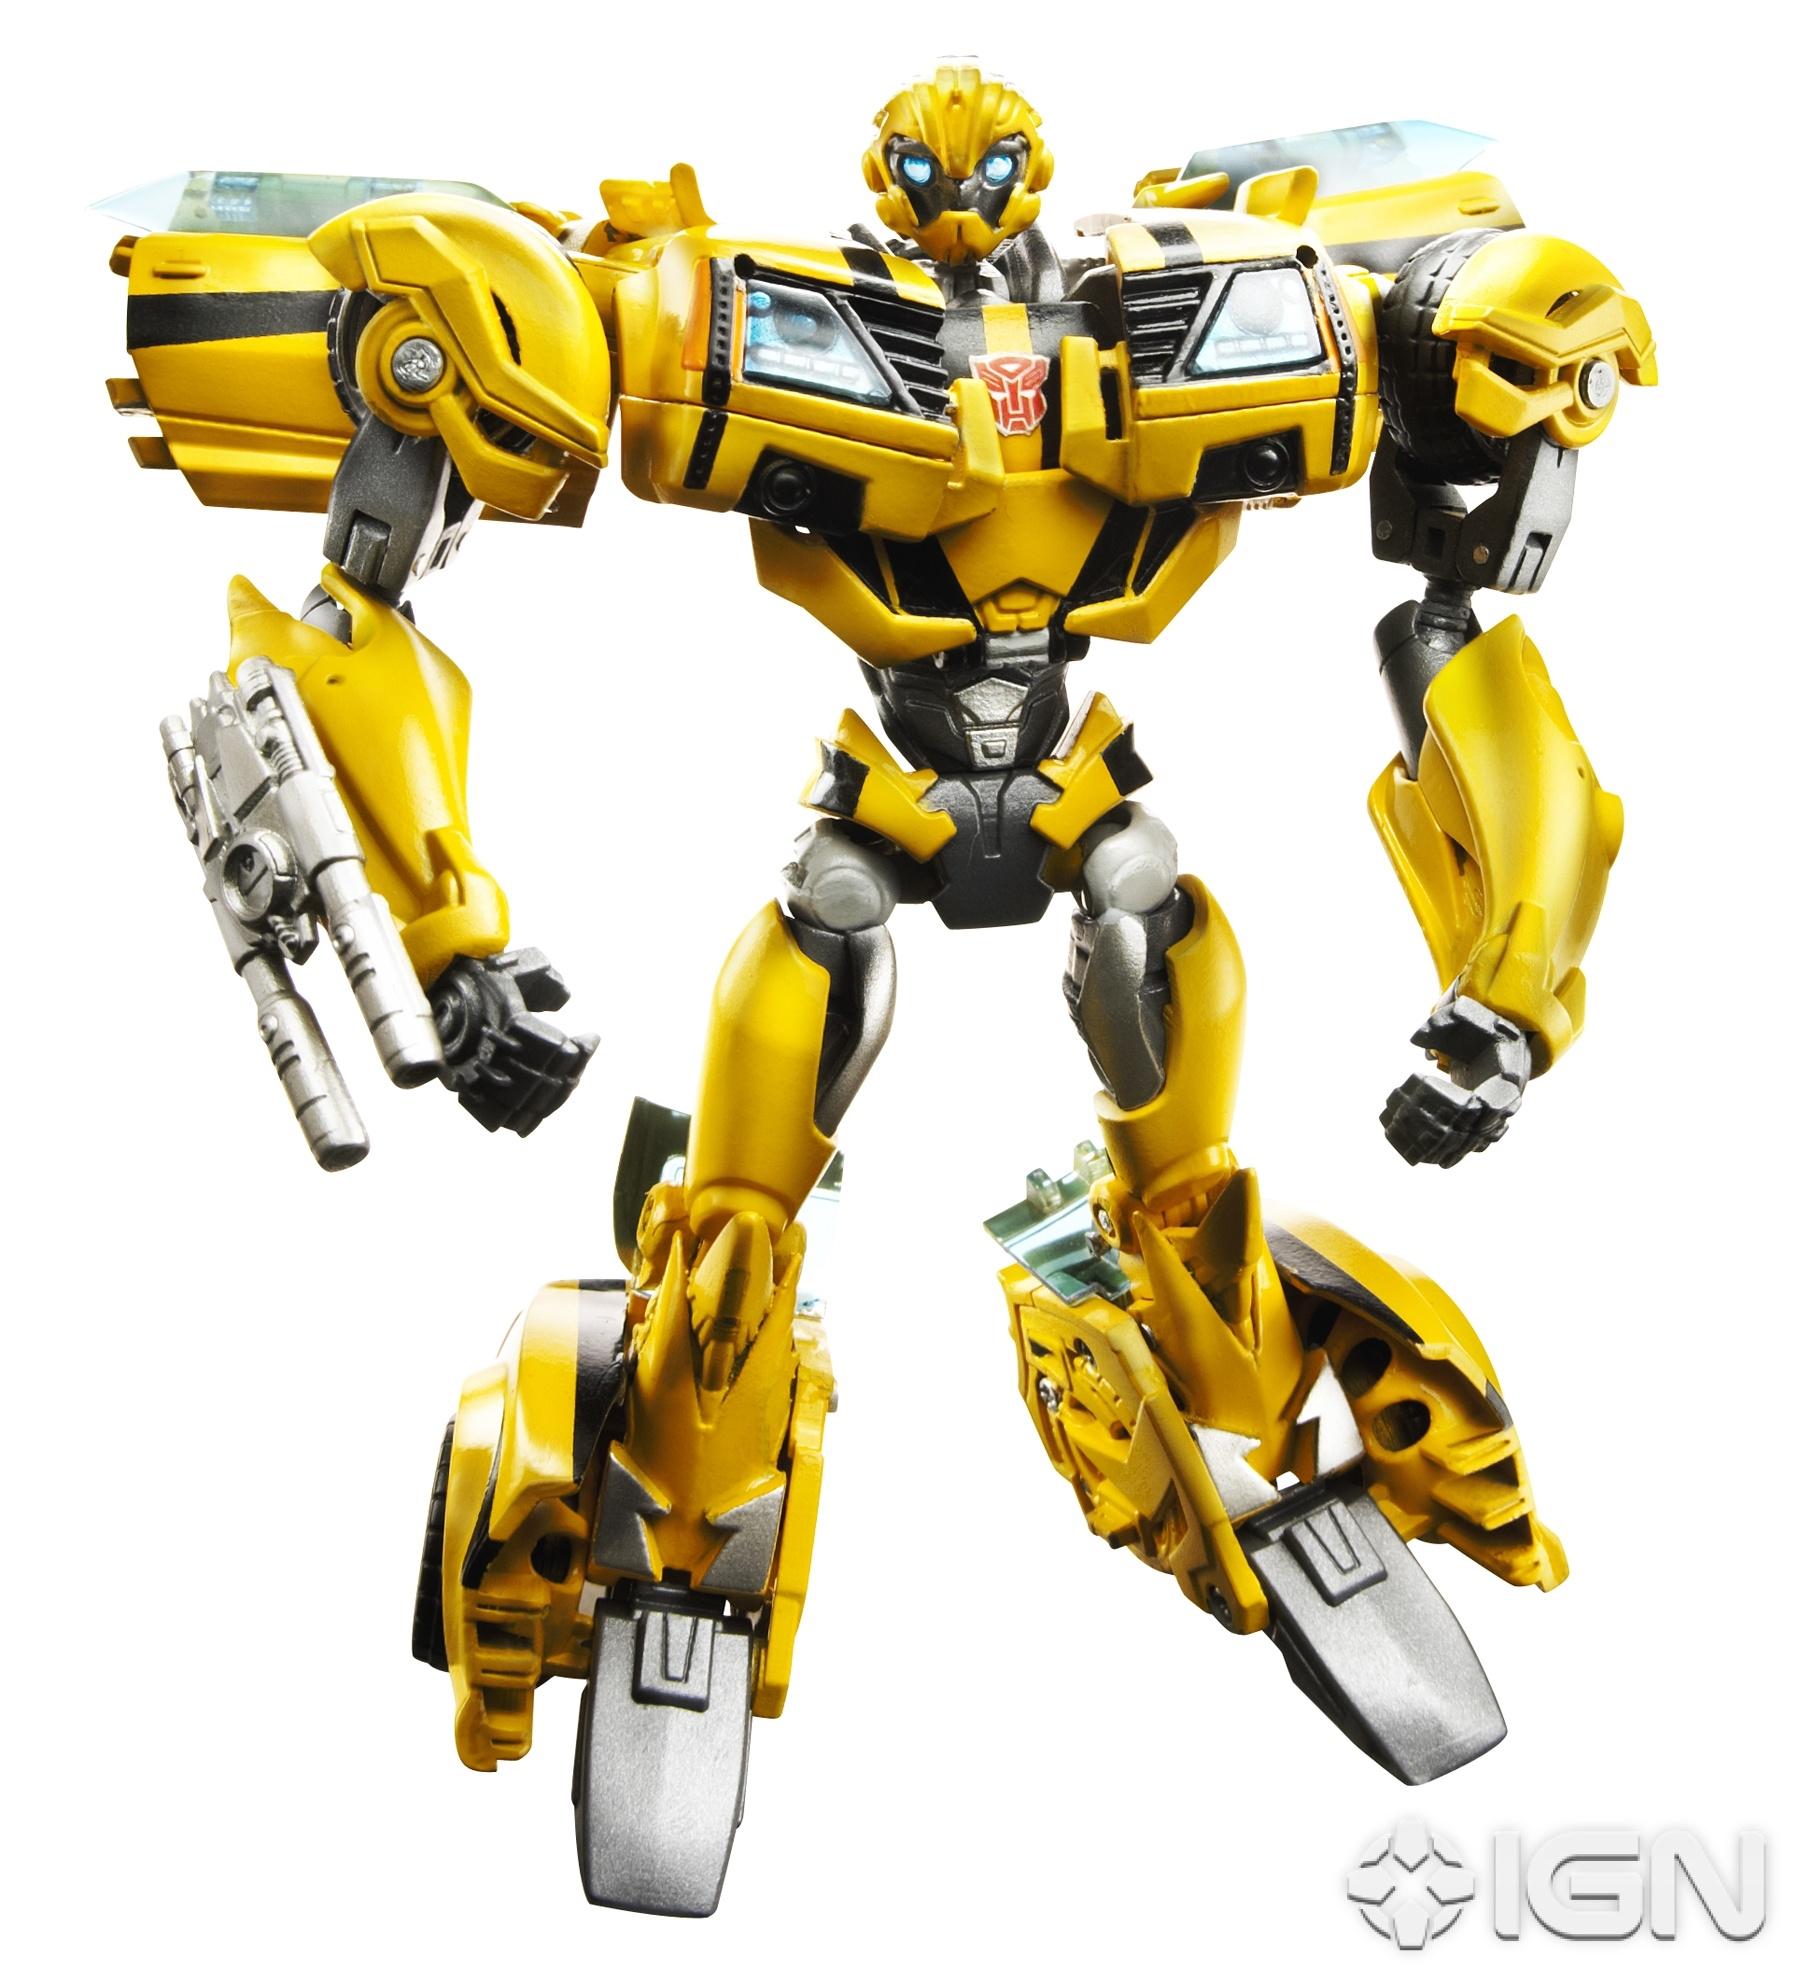 bumblebee transformer toy wallpaper